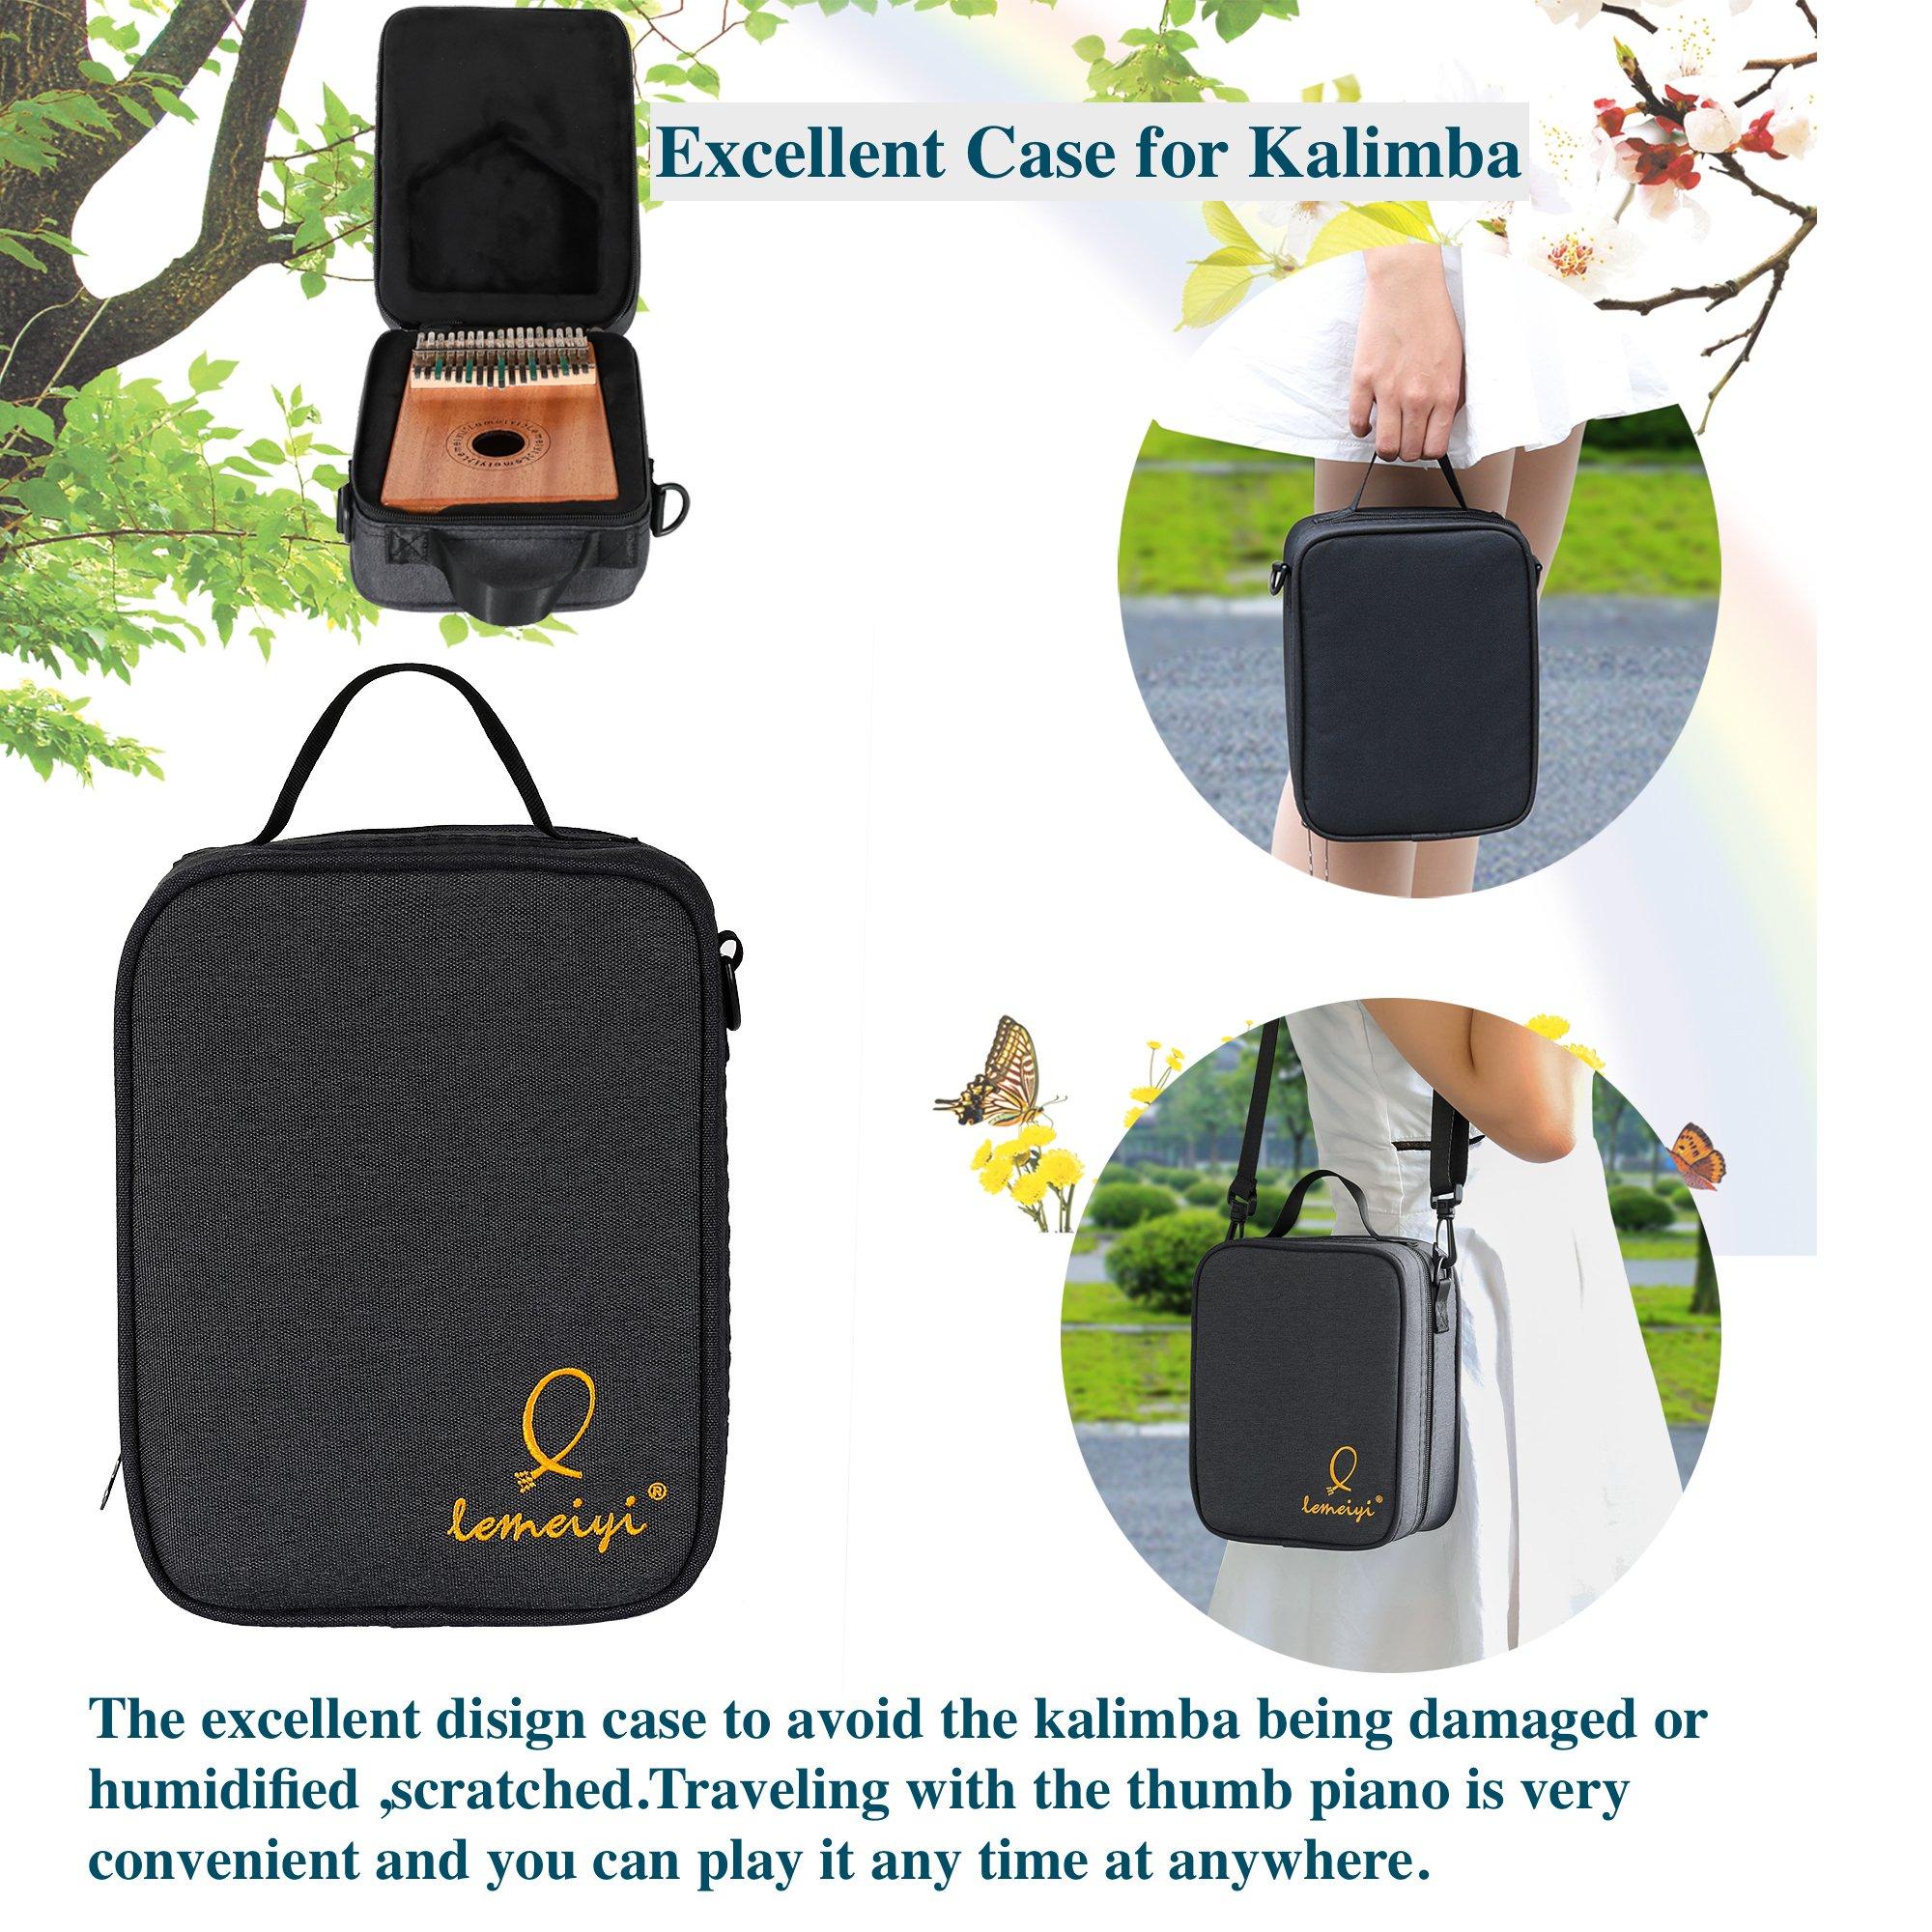 LEMEIYI Kalimba 17 Key with Mahogany,Portable Thumb Piano Mbira Sanza of Wooden Attached Ore Metal Tines with Kalimba Case by Lemeiyi (Image #5)